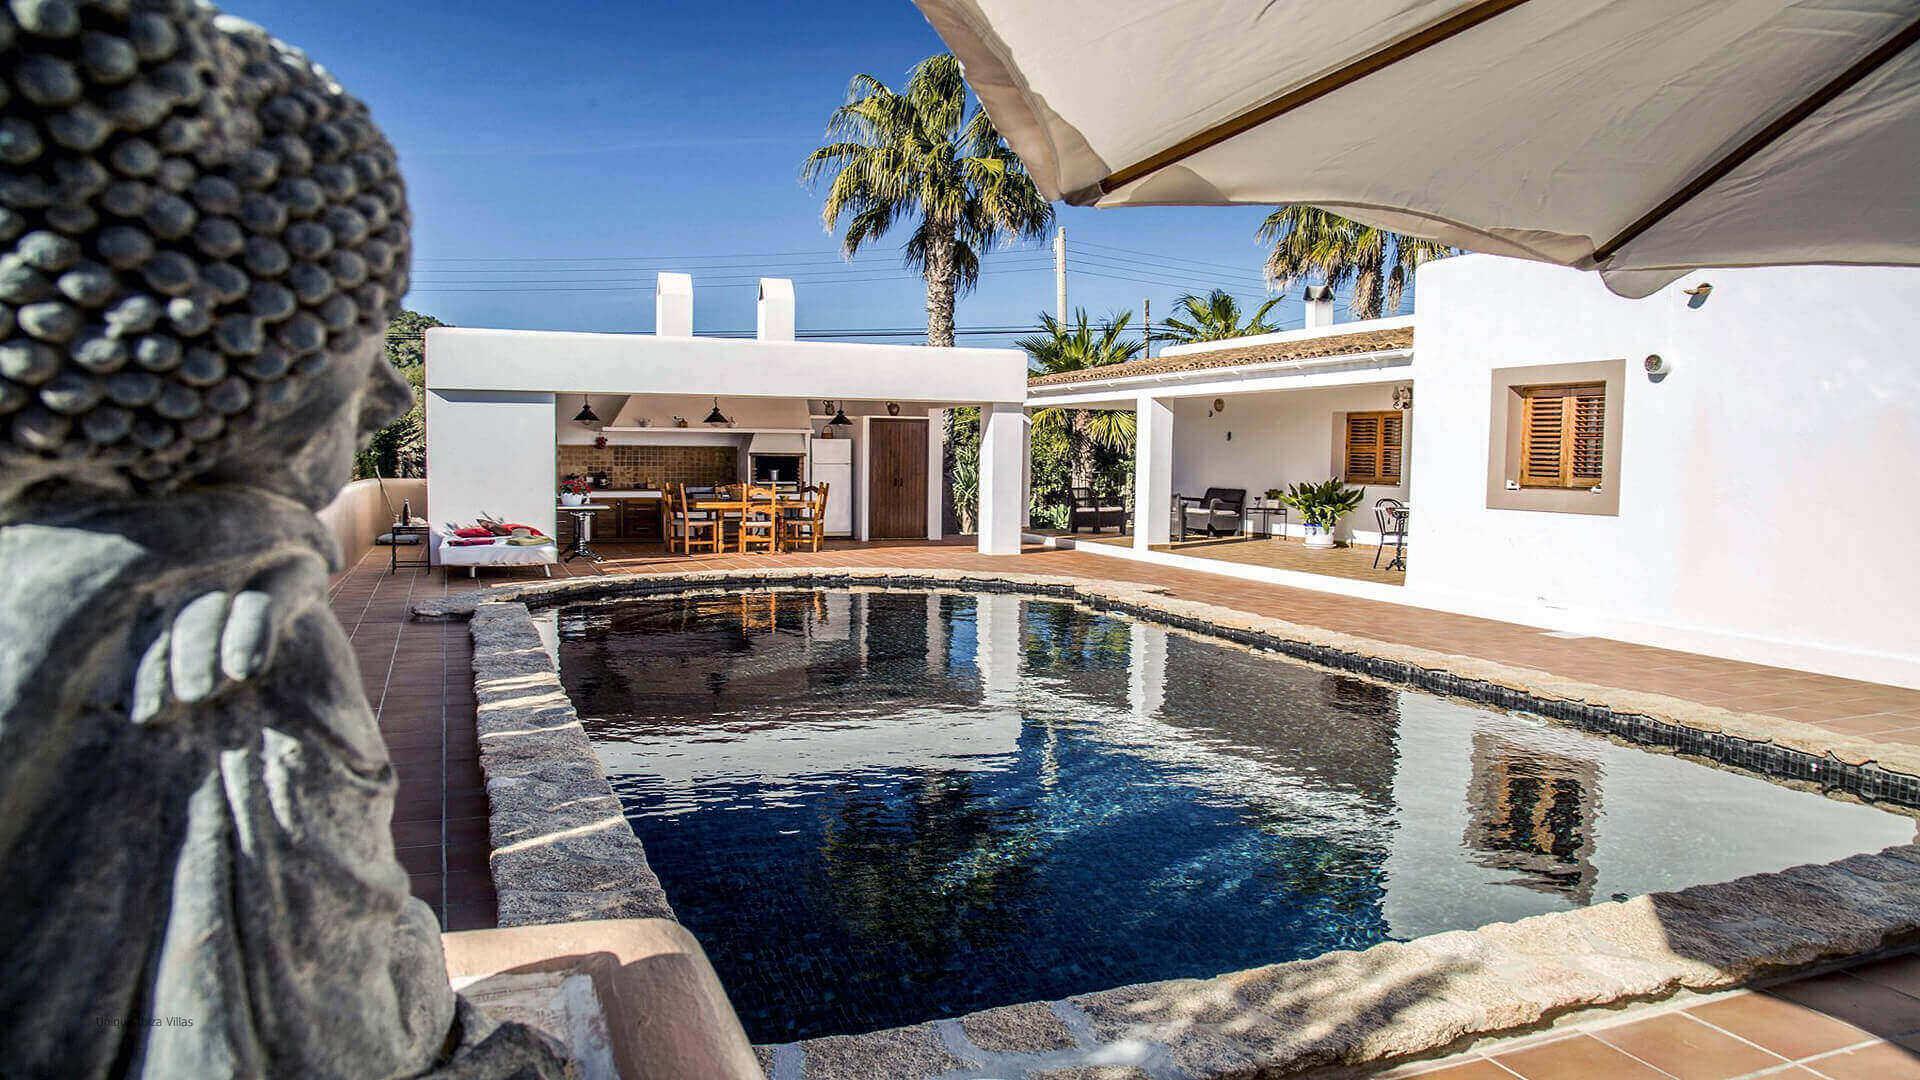 Villa Andrea Ibiza 2 KM4 Near Ibiza Town